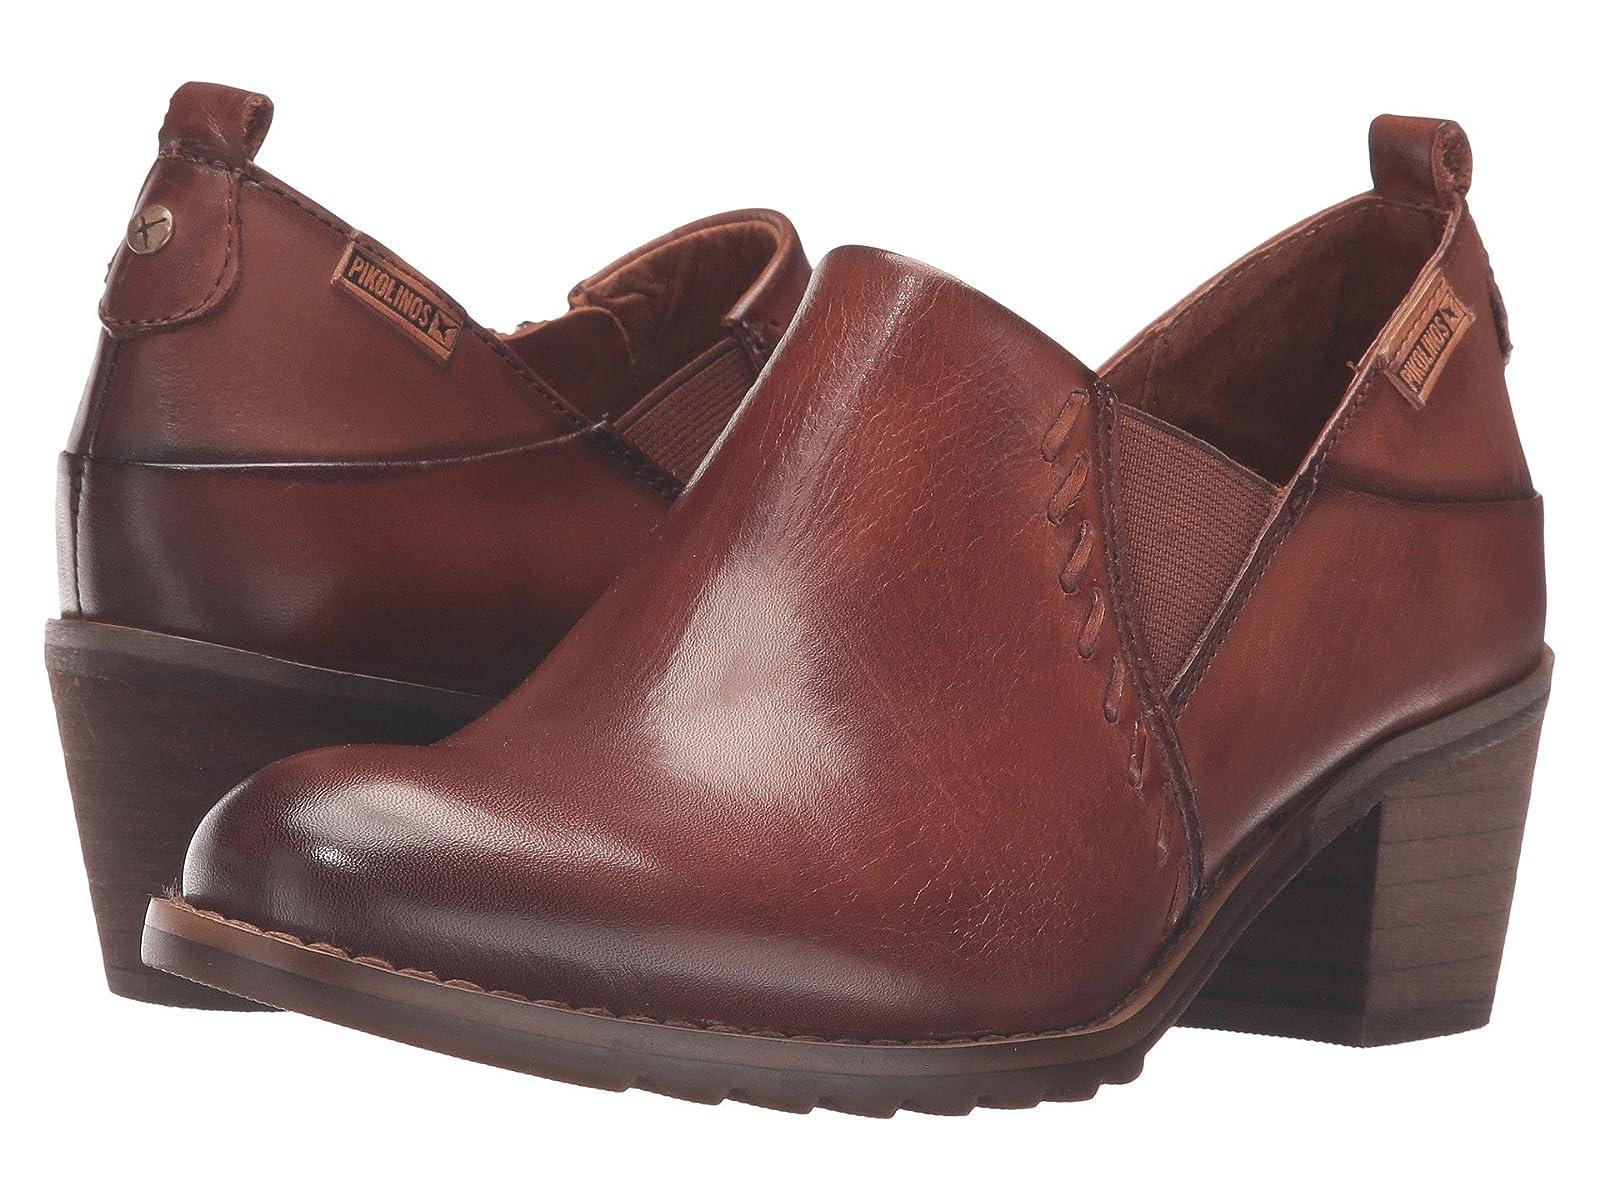 Pikolinos Andorra 913-5652Atmospheric grades have affordable shoes